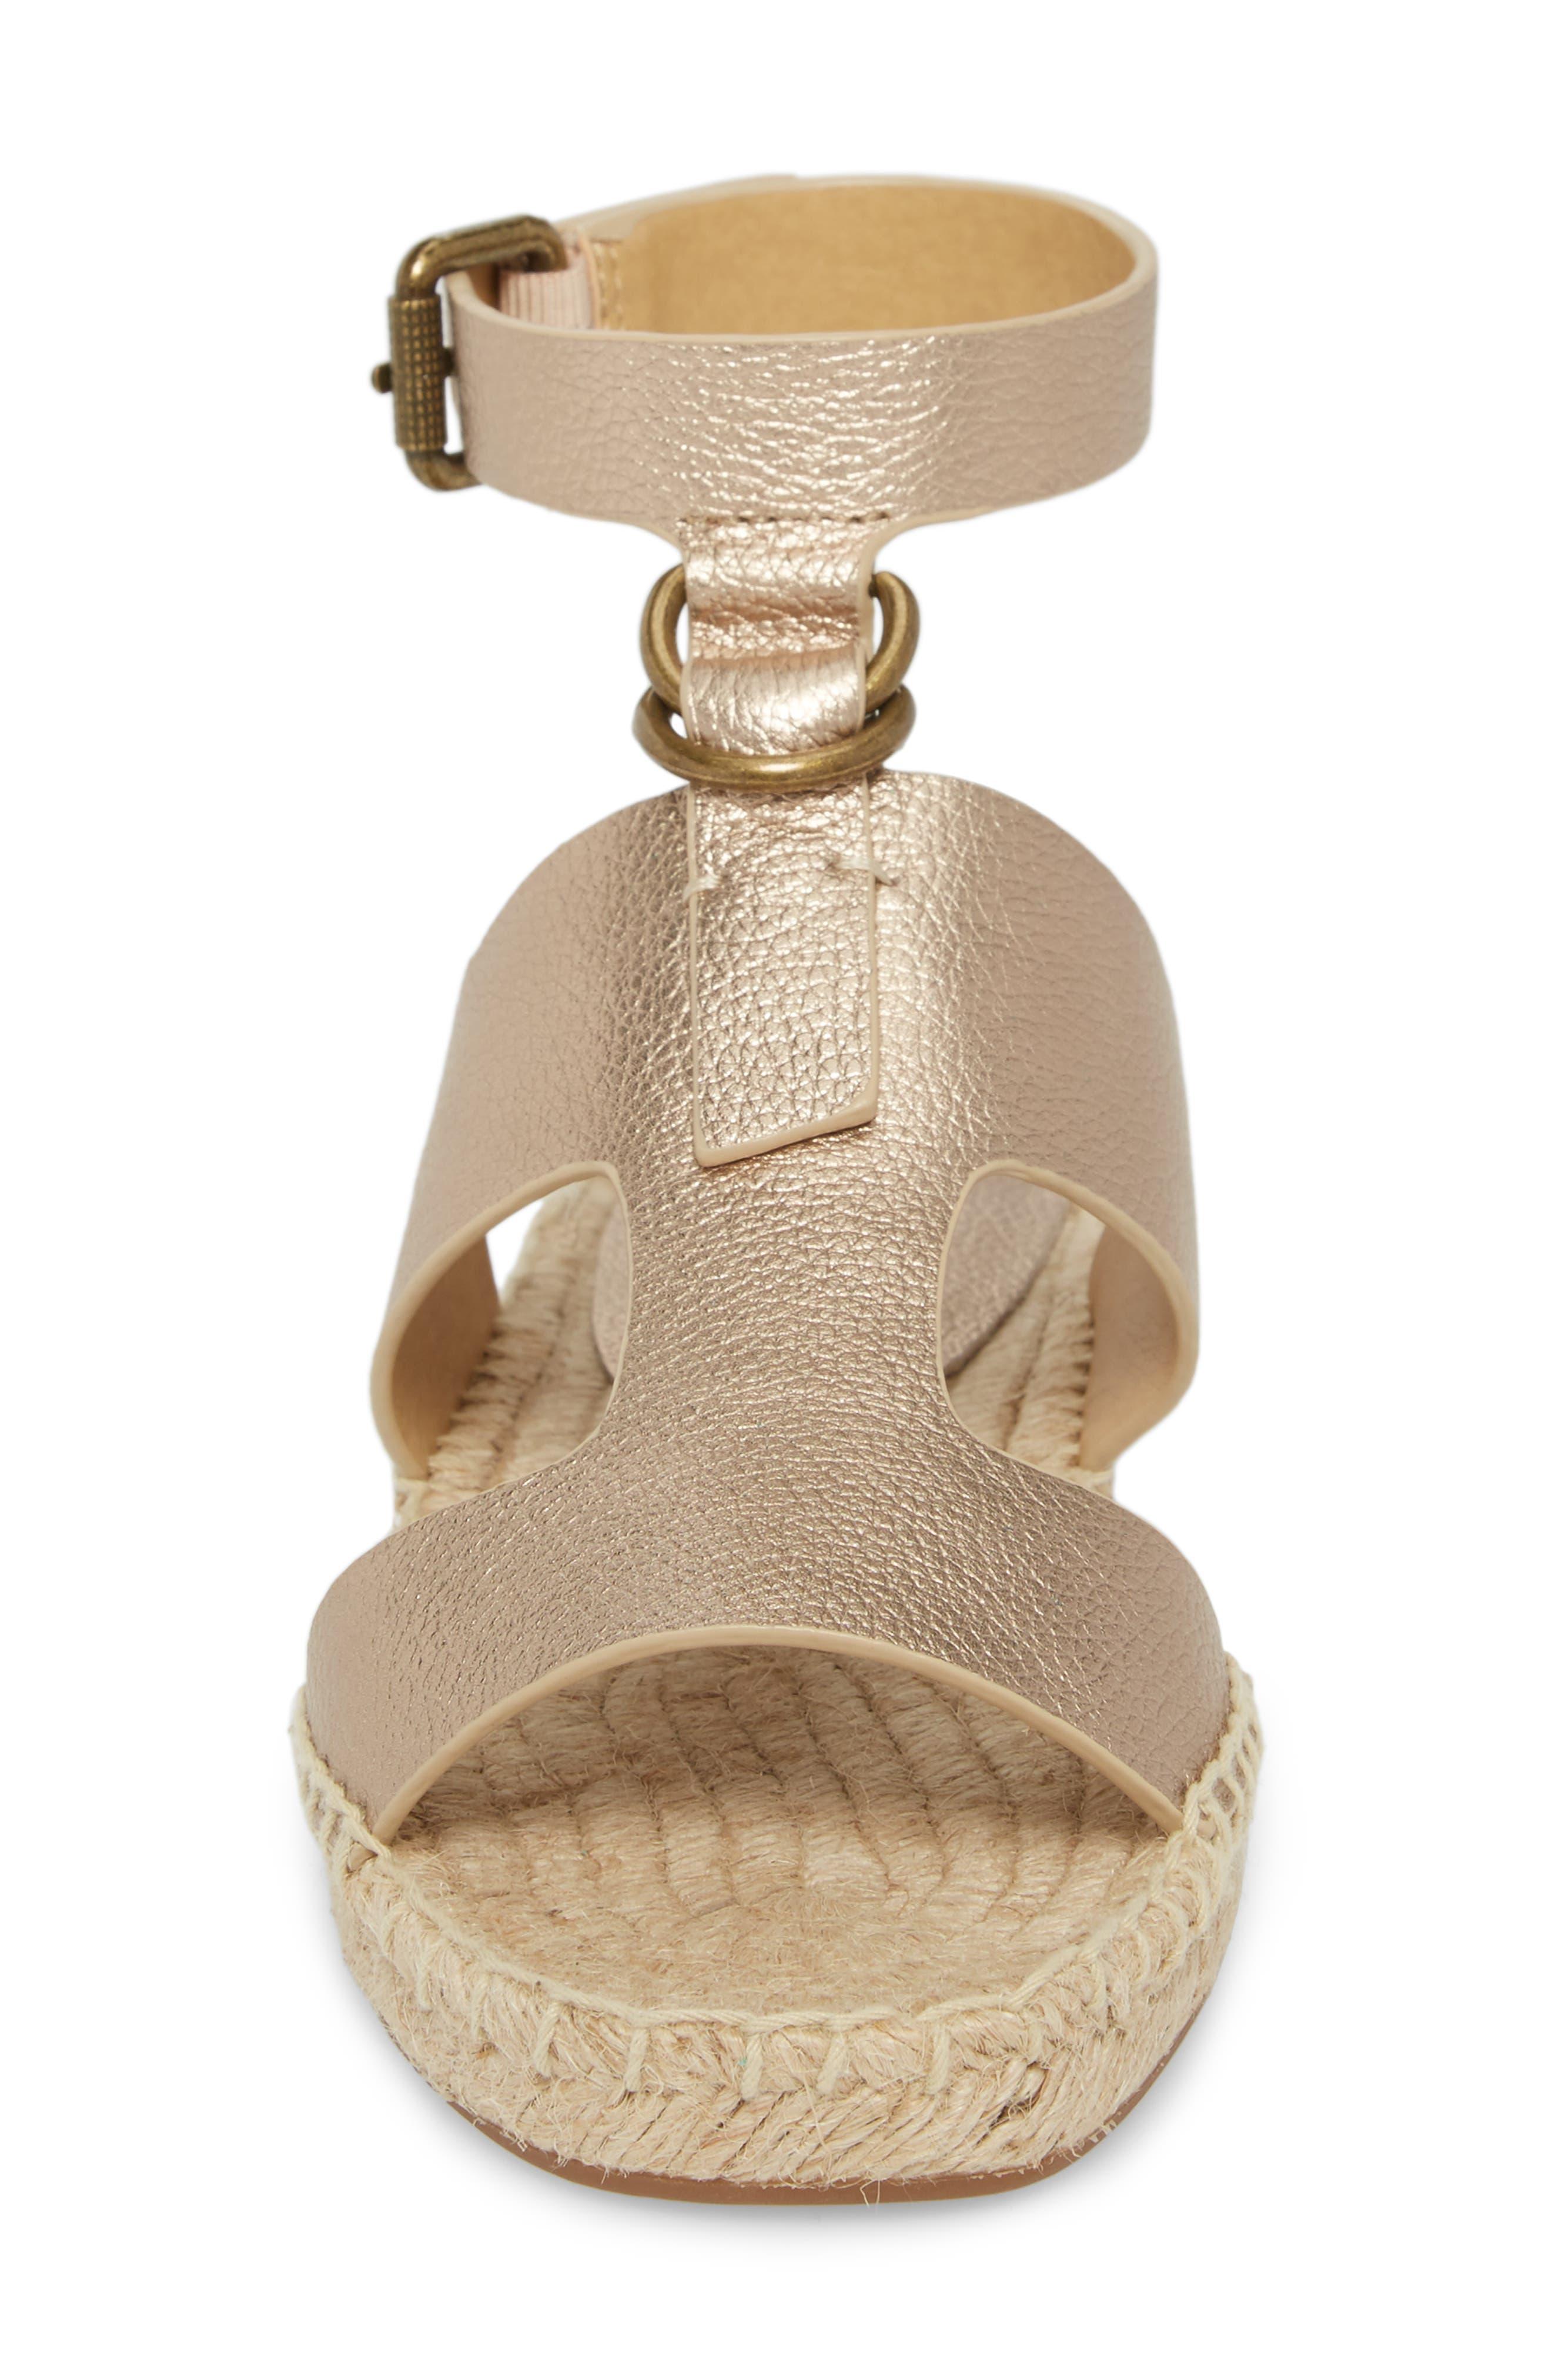 Farley Espadrille Sandal,                             Alternate thumbnail 4, color,                             Champagne Leather